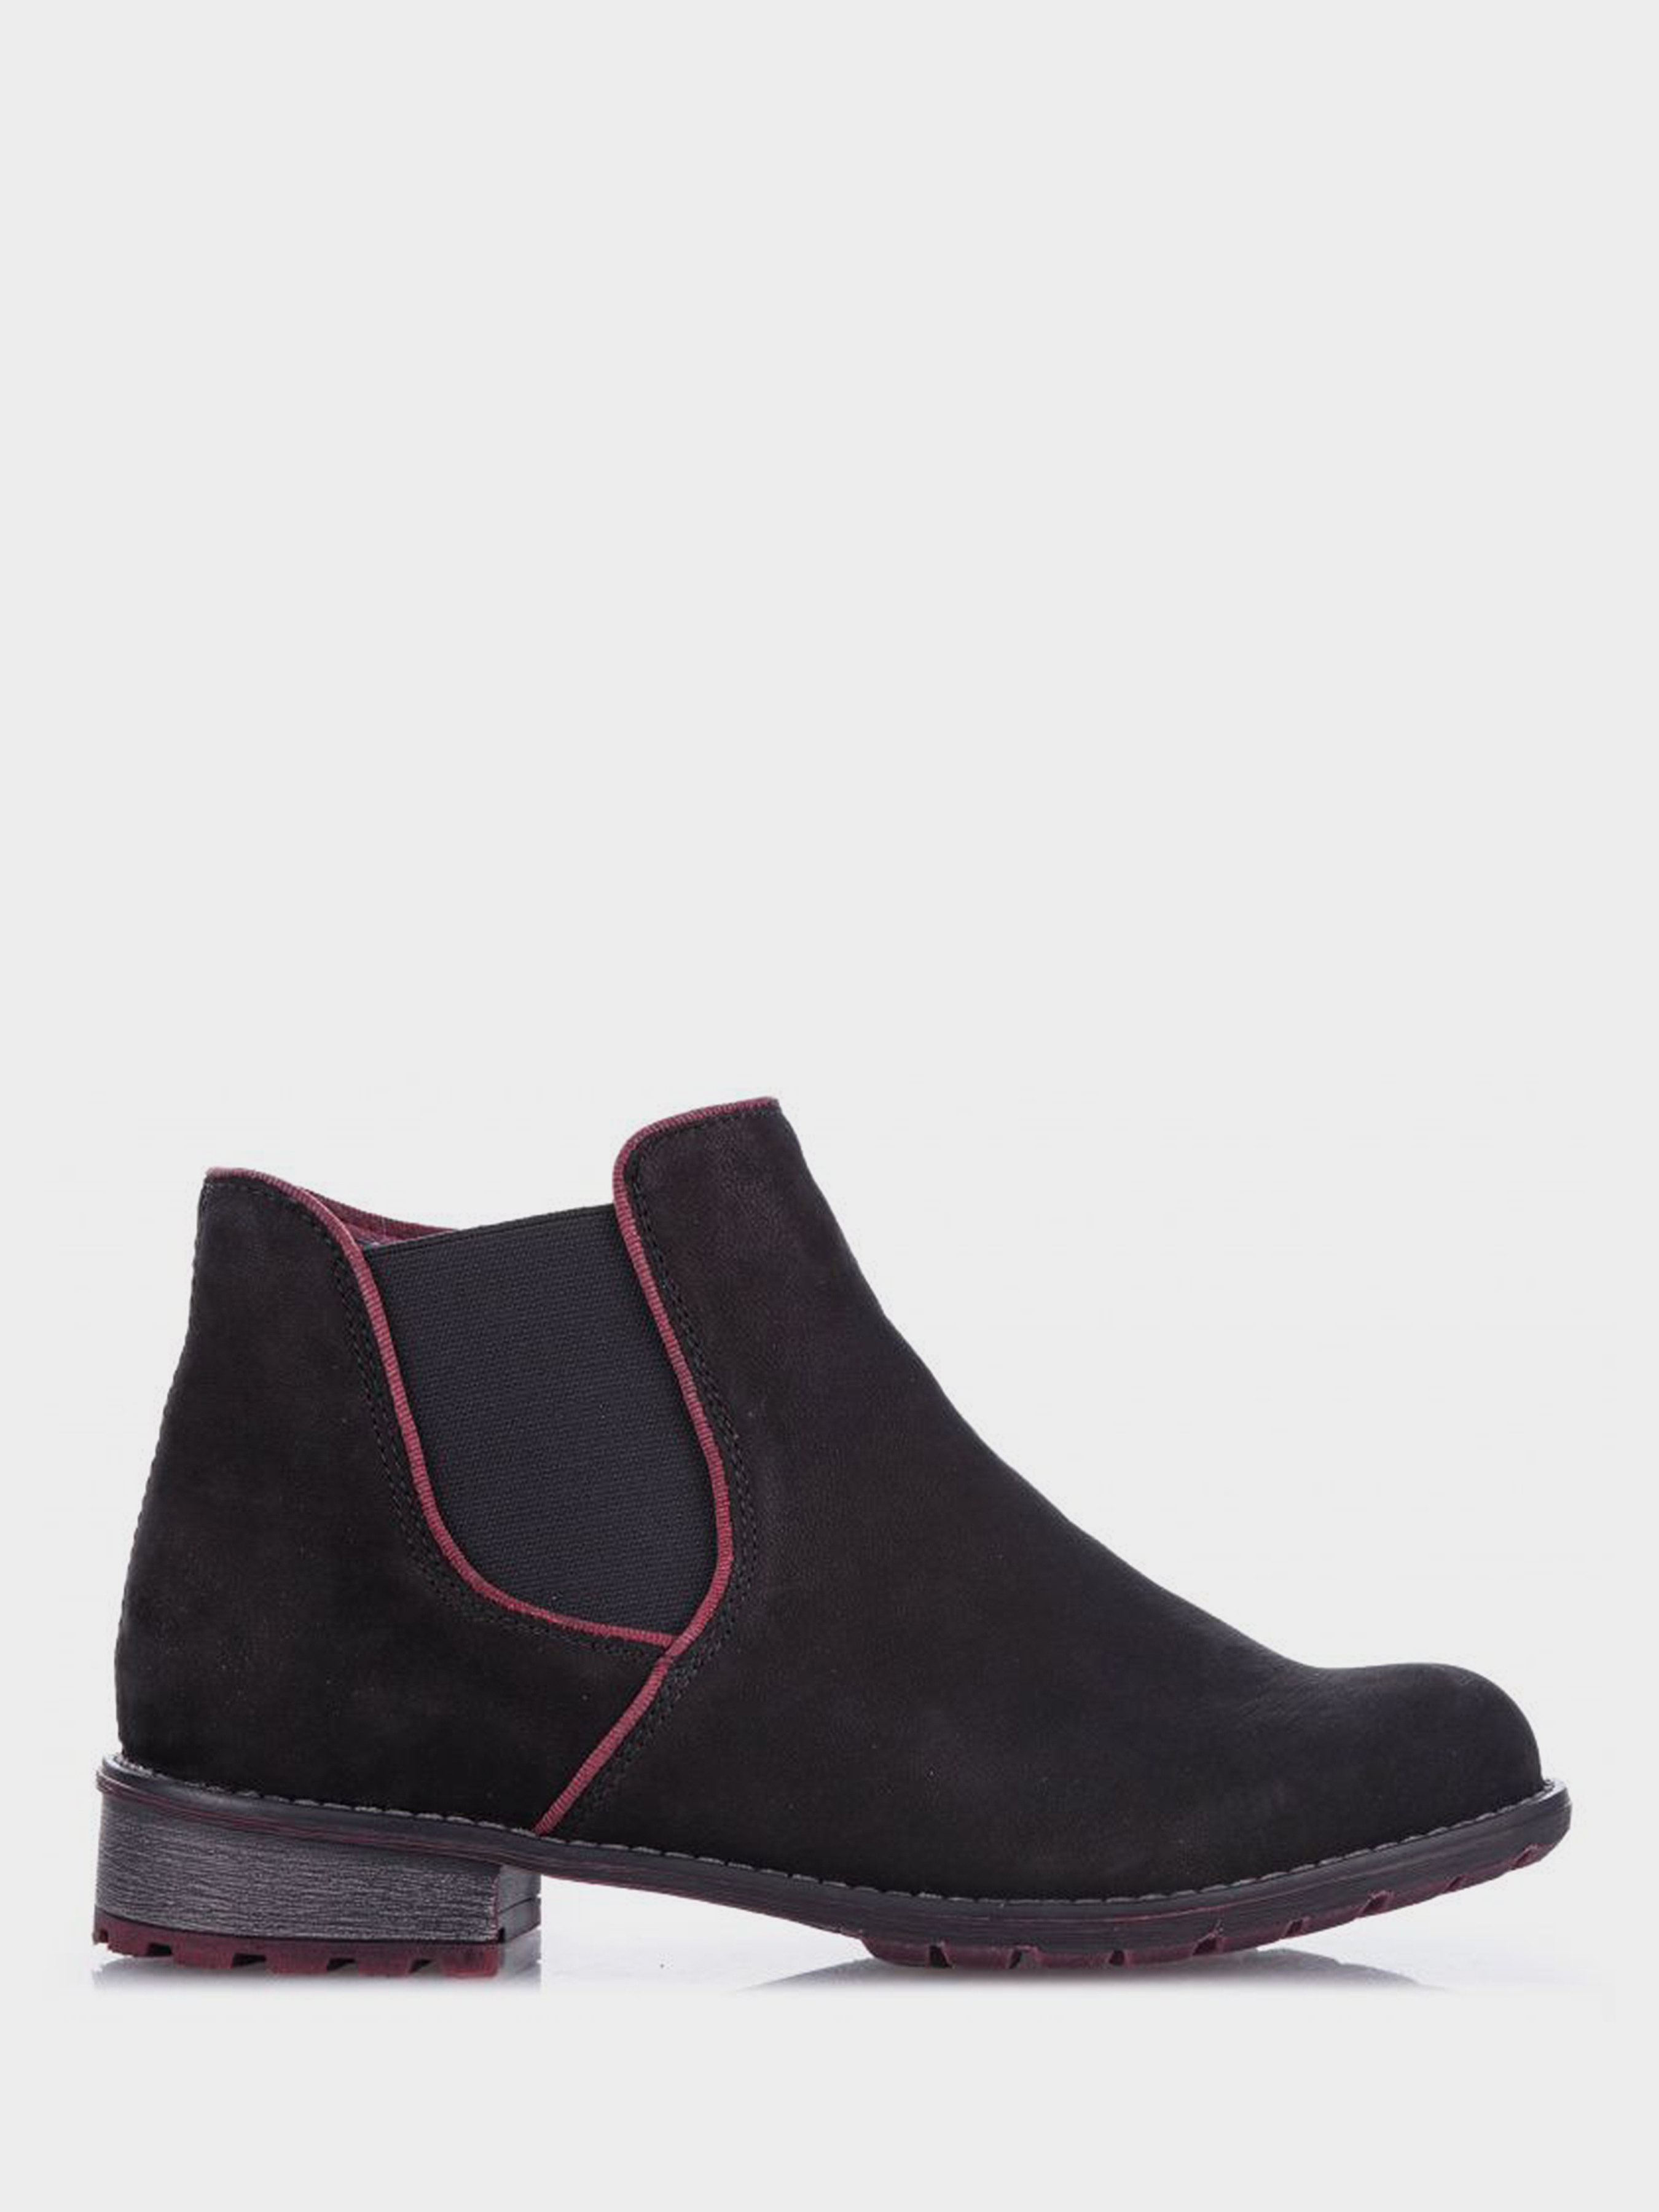 Ботинки для женщин Remonte RD11 цена, 2017